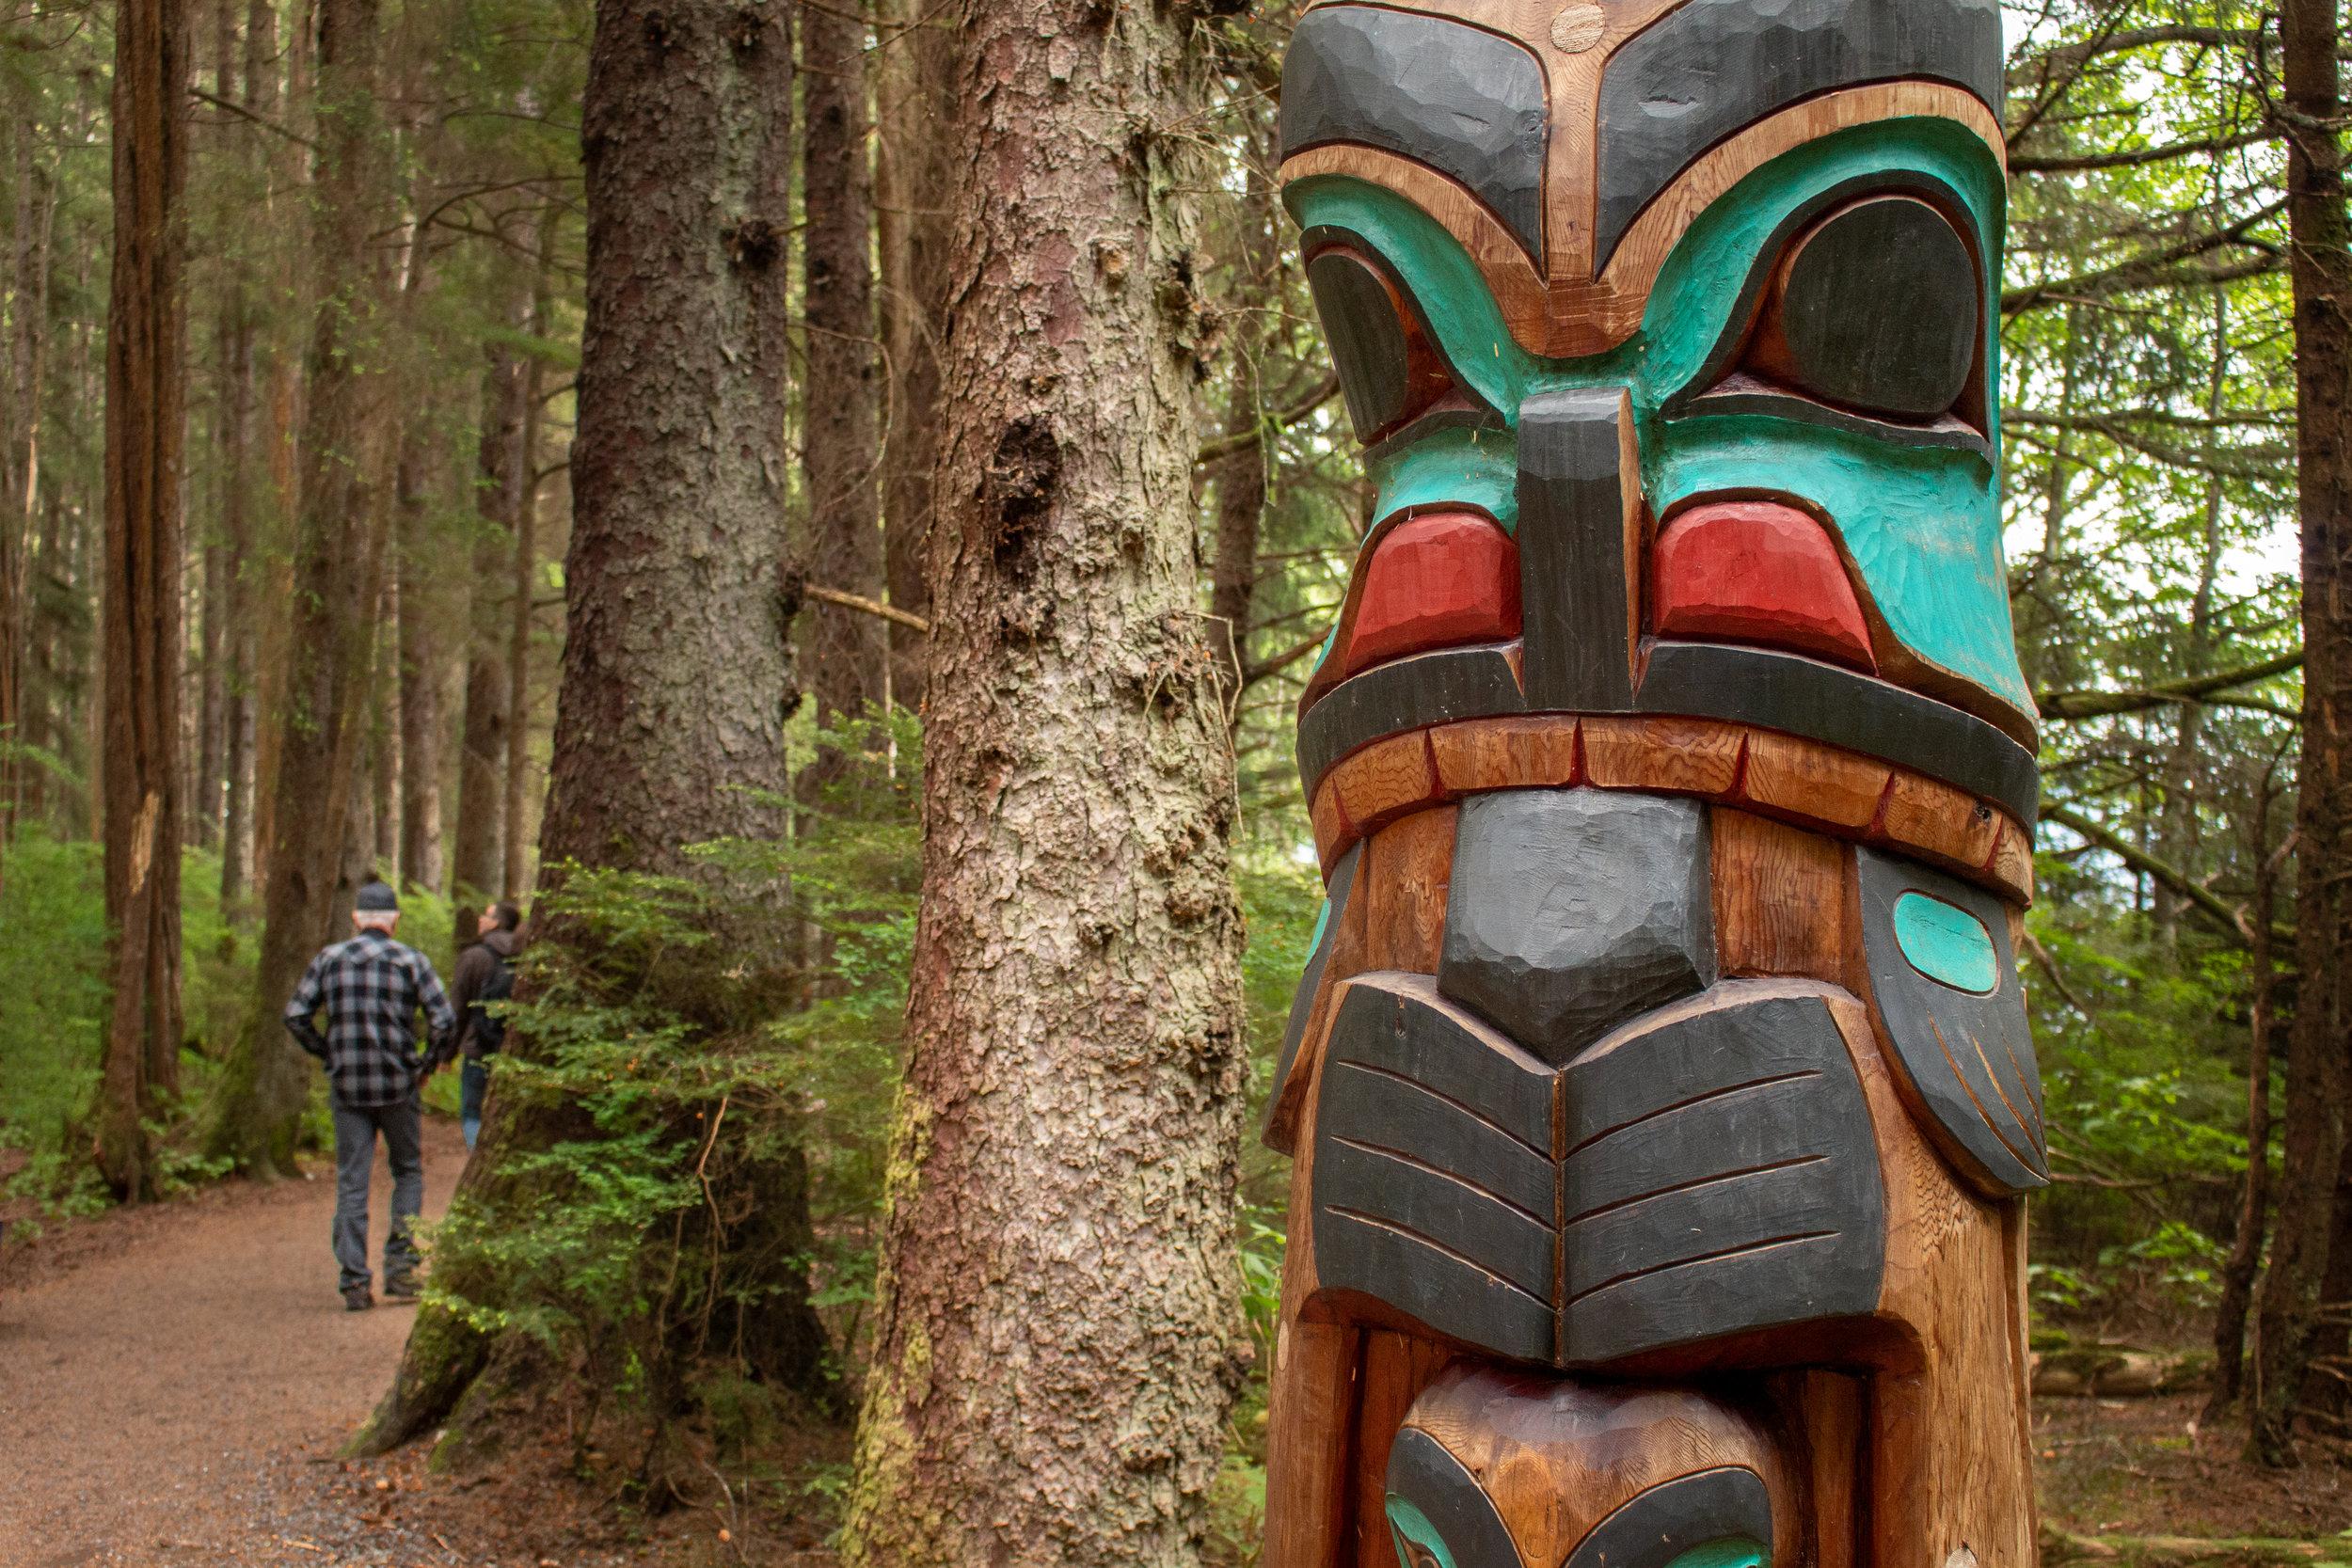 Yaadaas Crest Totem Pole, Sitka, Alaka; Sitka National Historic Park